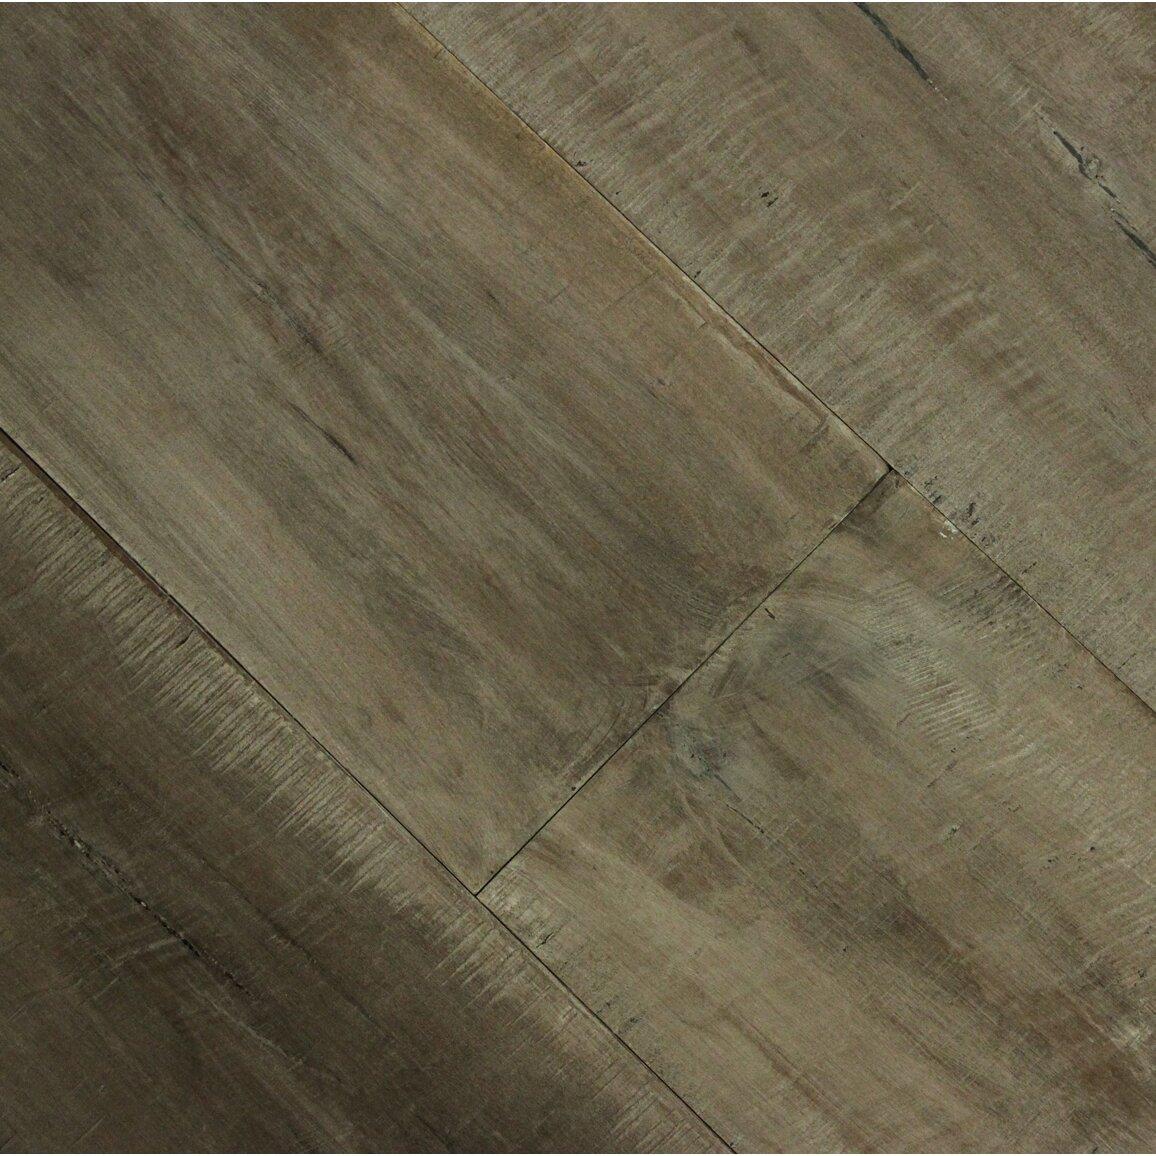 Albero valley farmhouse 7 1 2 engineered maple hardwood for Purchase hardwood flooring